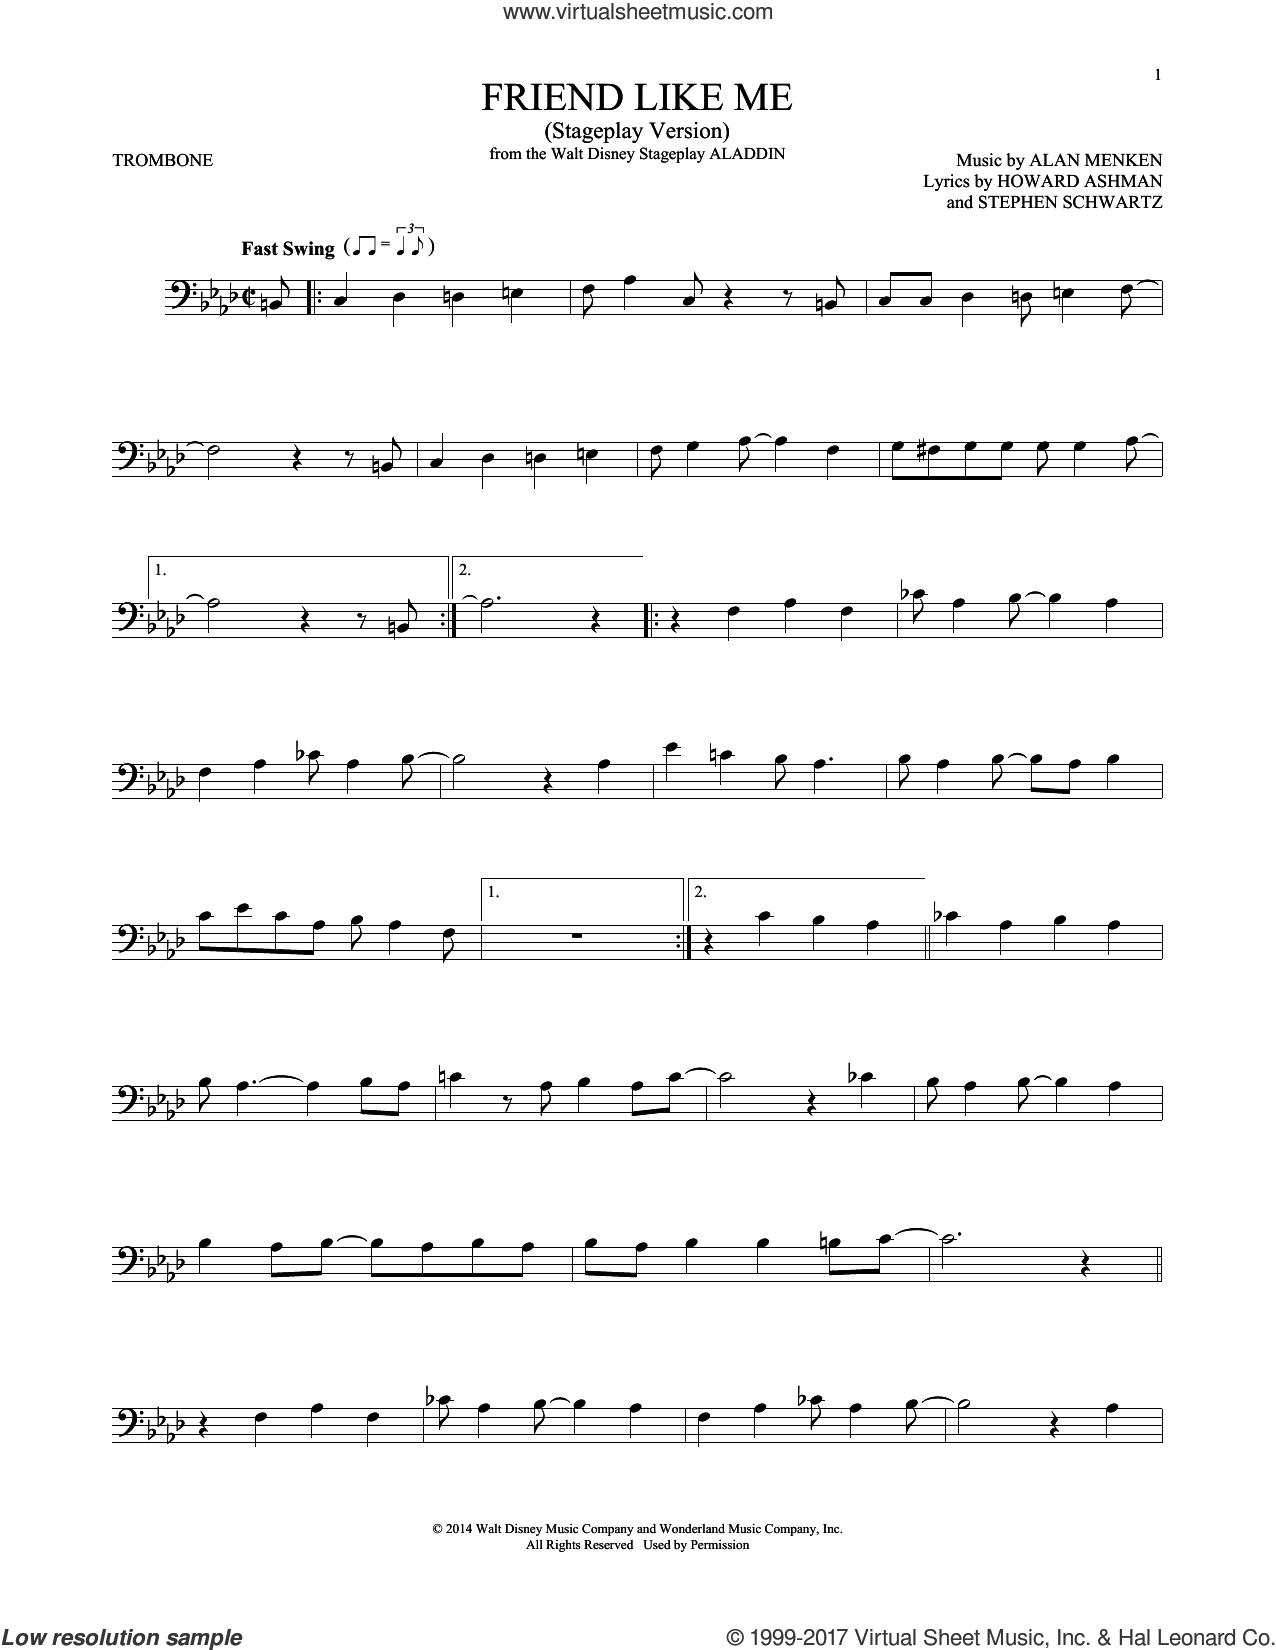 Friend Like Me (from Aladdin) (Stageplay Version) sheet music for trombone solo by Alan Menken, Howard Ashman and Stephen Schwartz, intermediate skill level